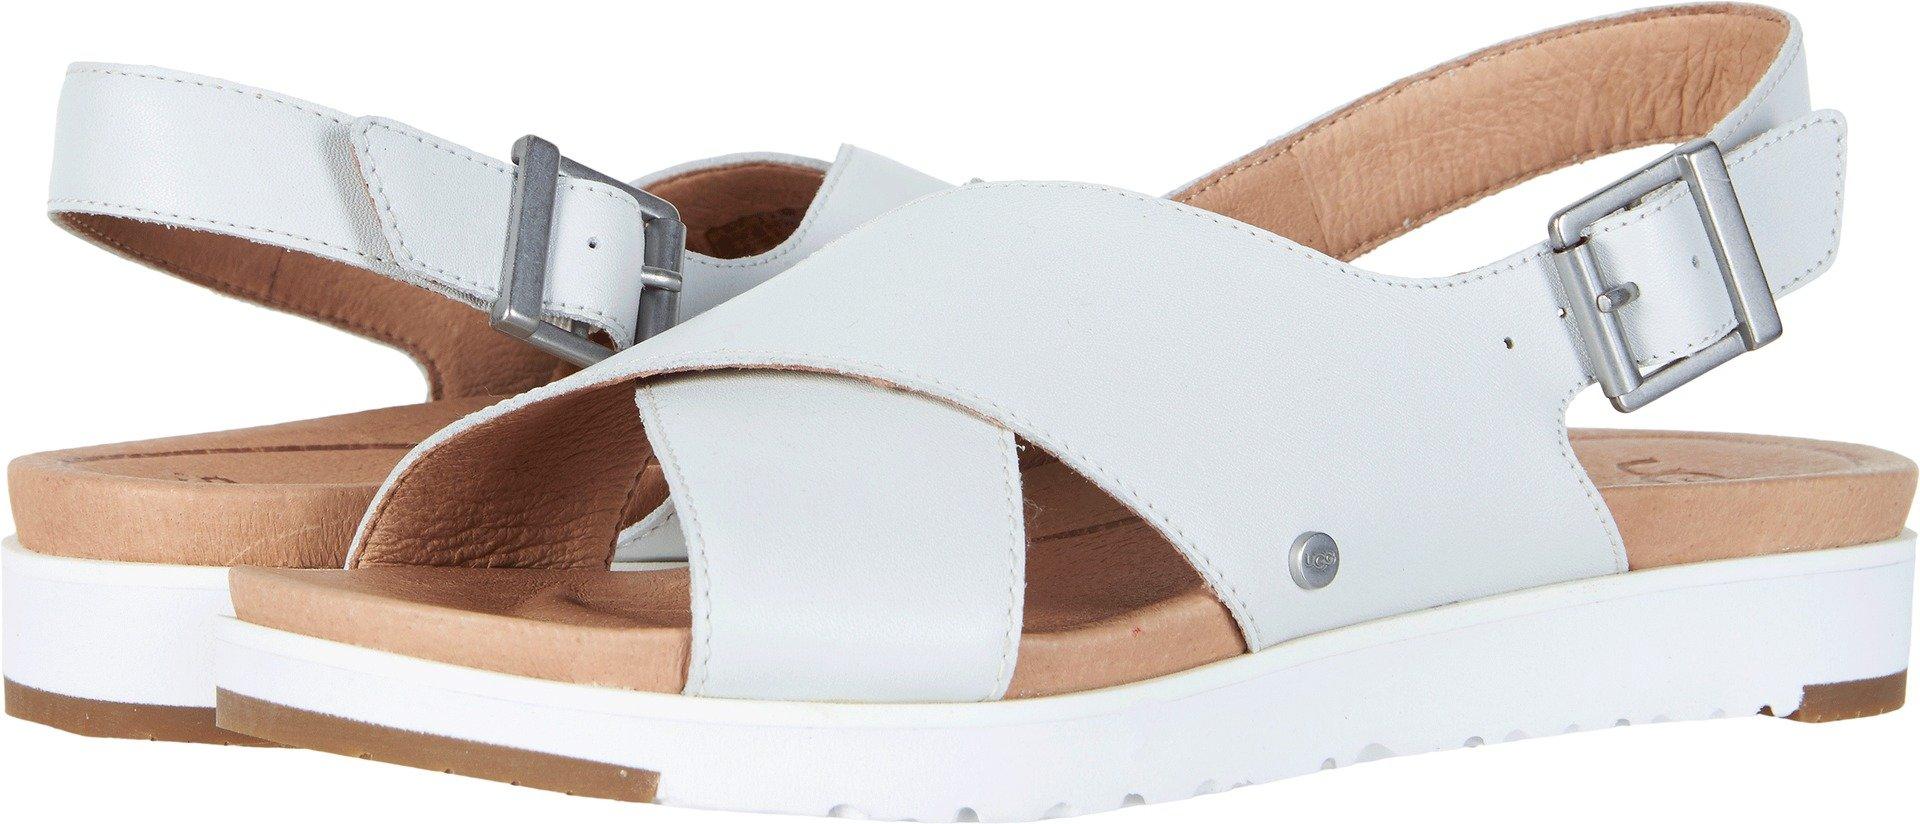 UGG Women's Kamile Flat Sandal, White, 9 M US